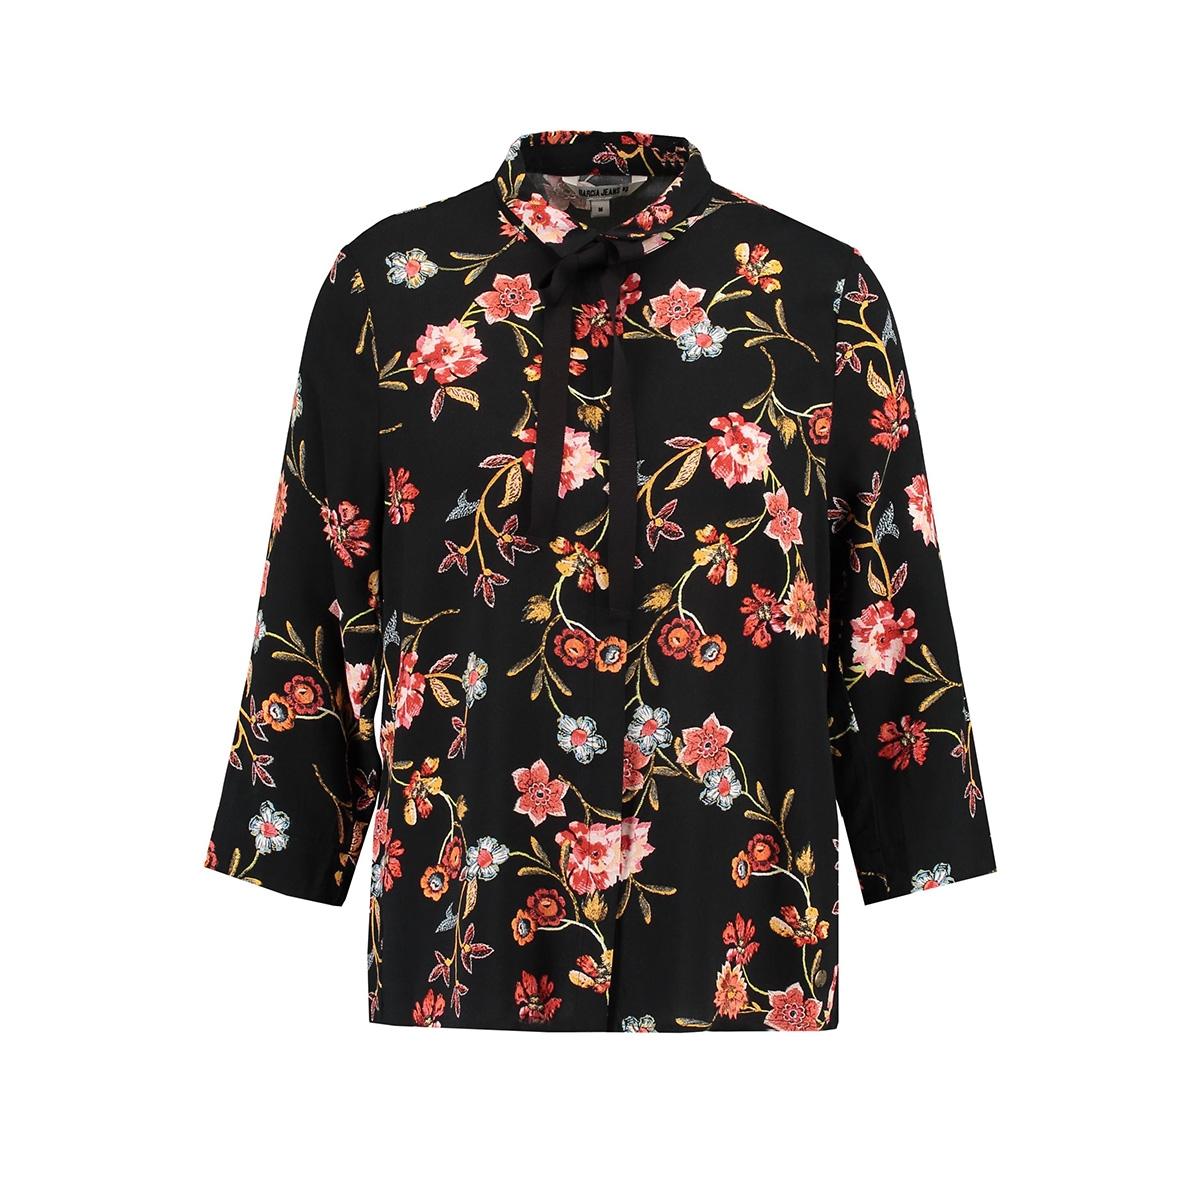 t80236 garcia blouse 60 black